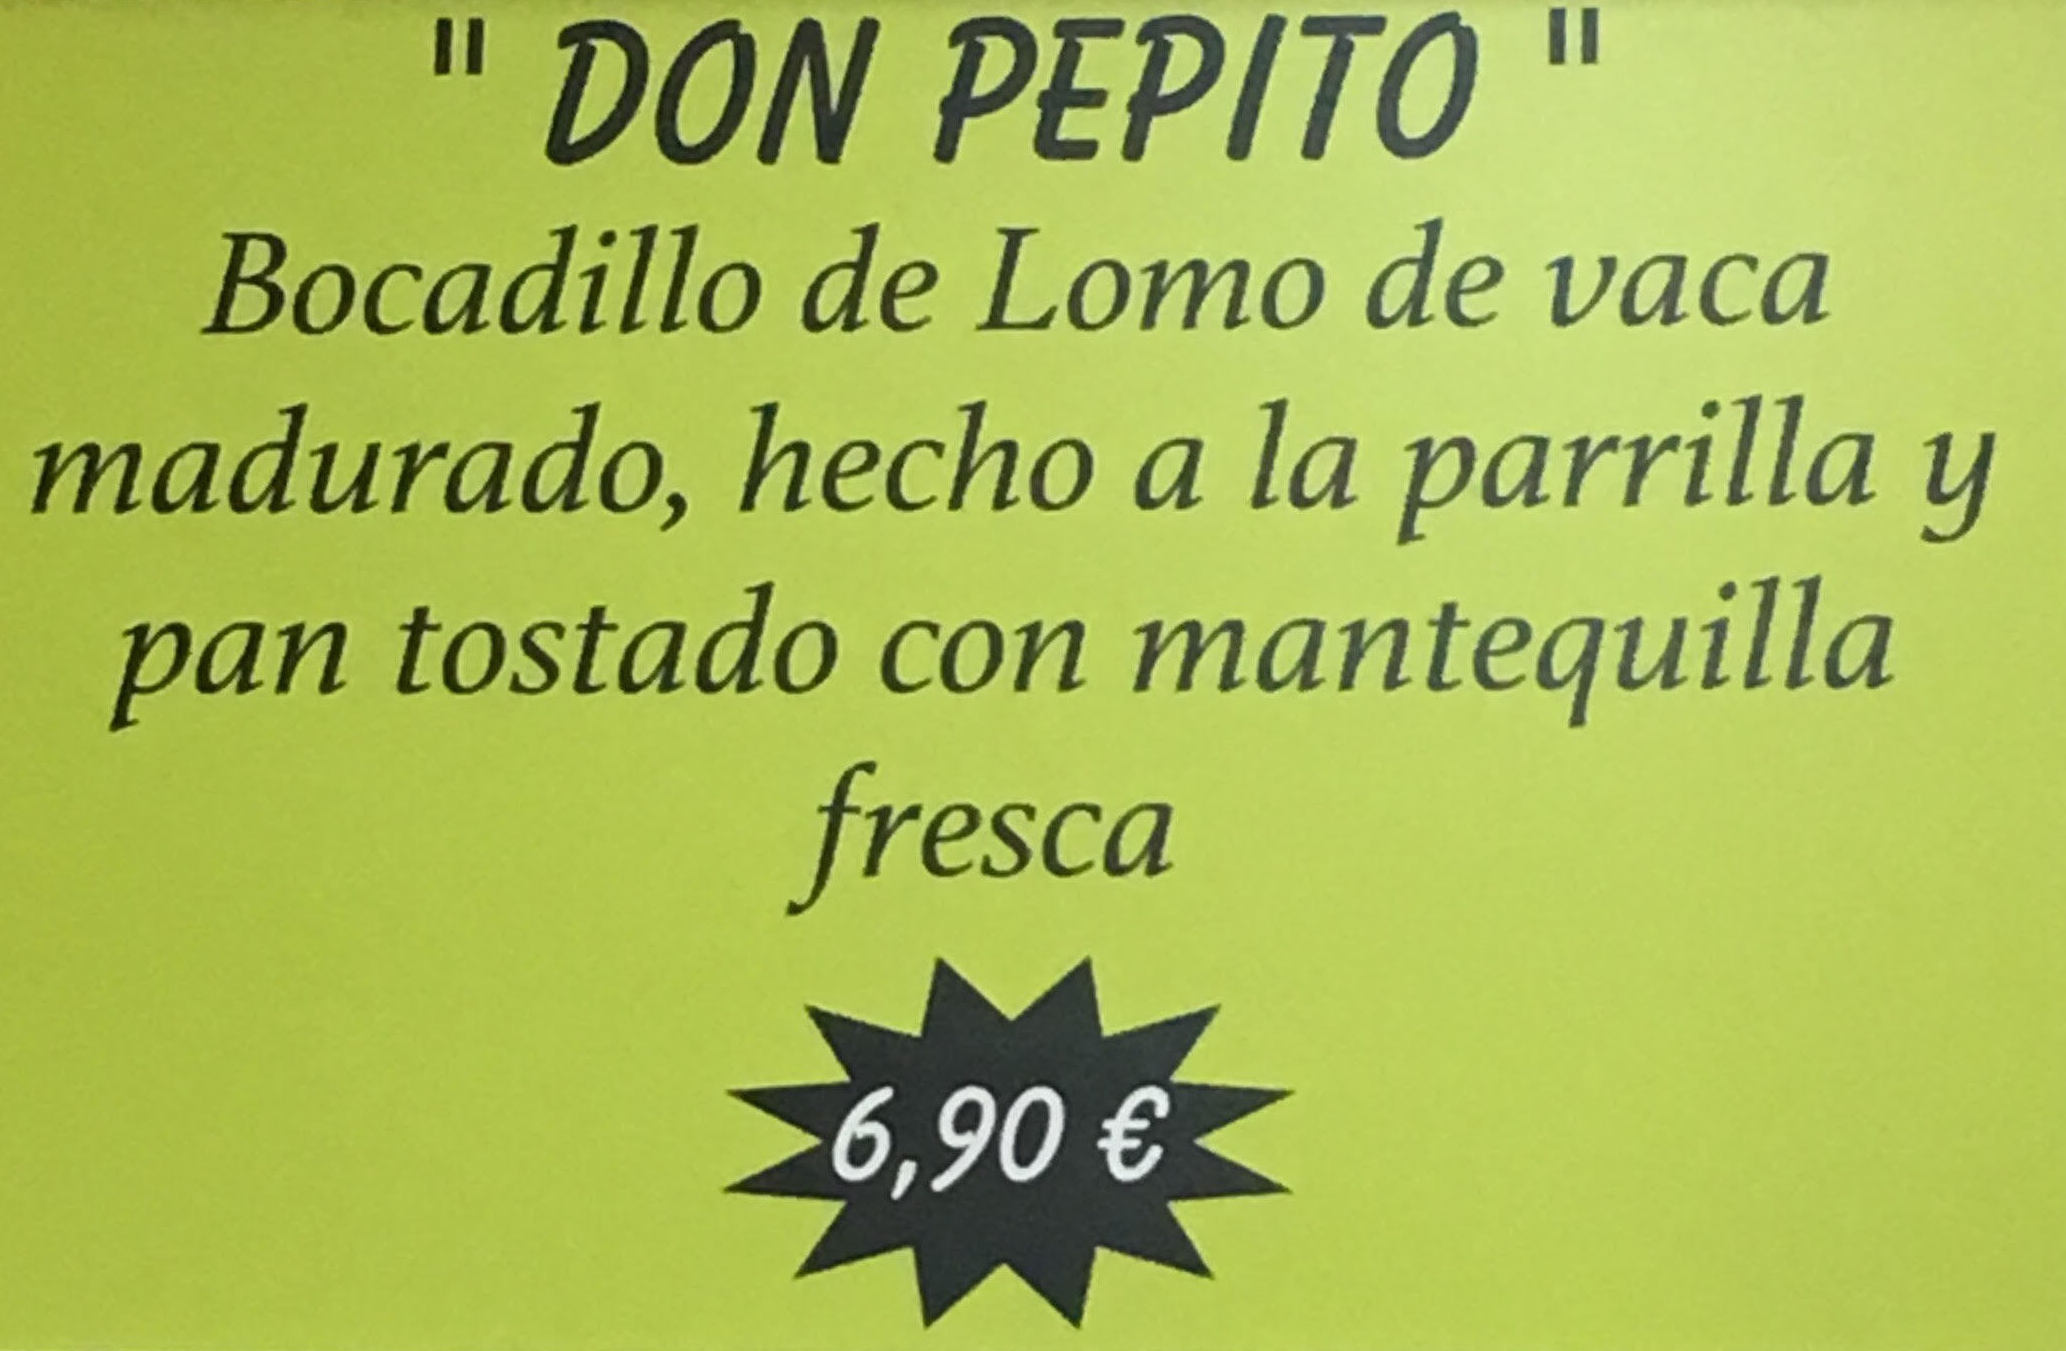 Comer bocatas Mercamadrid / Restaurante Narcea